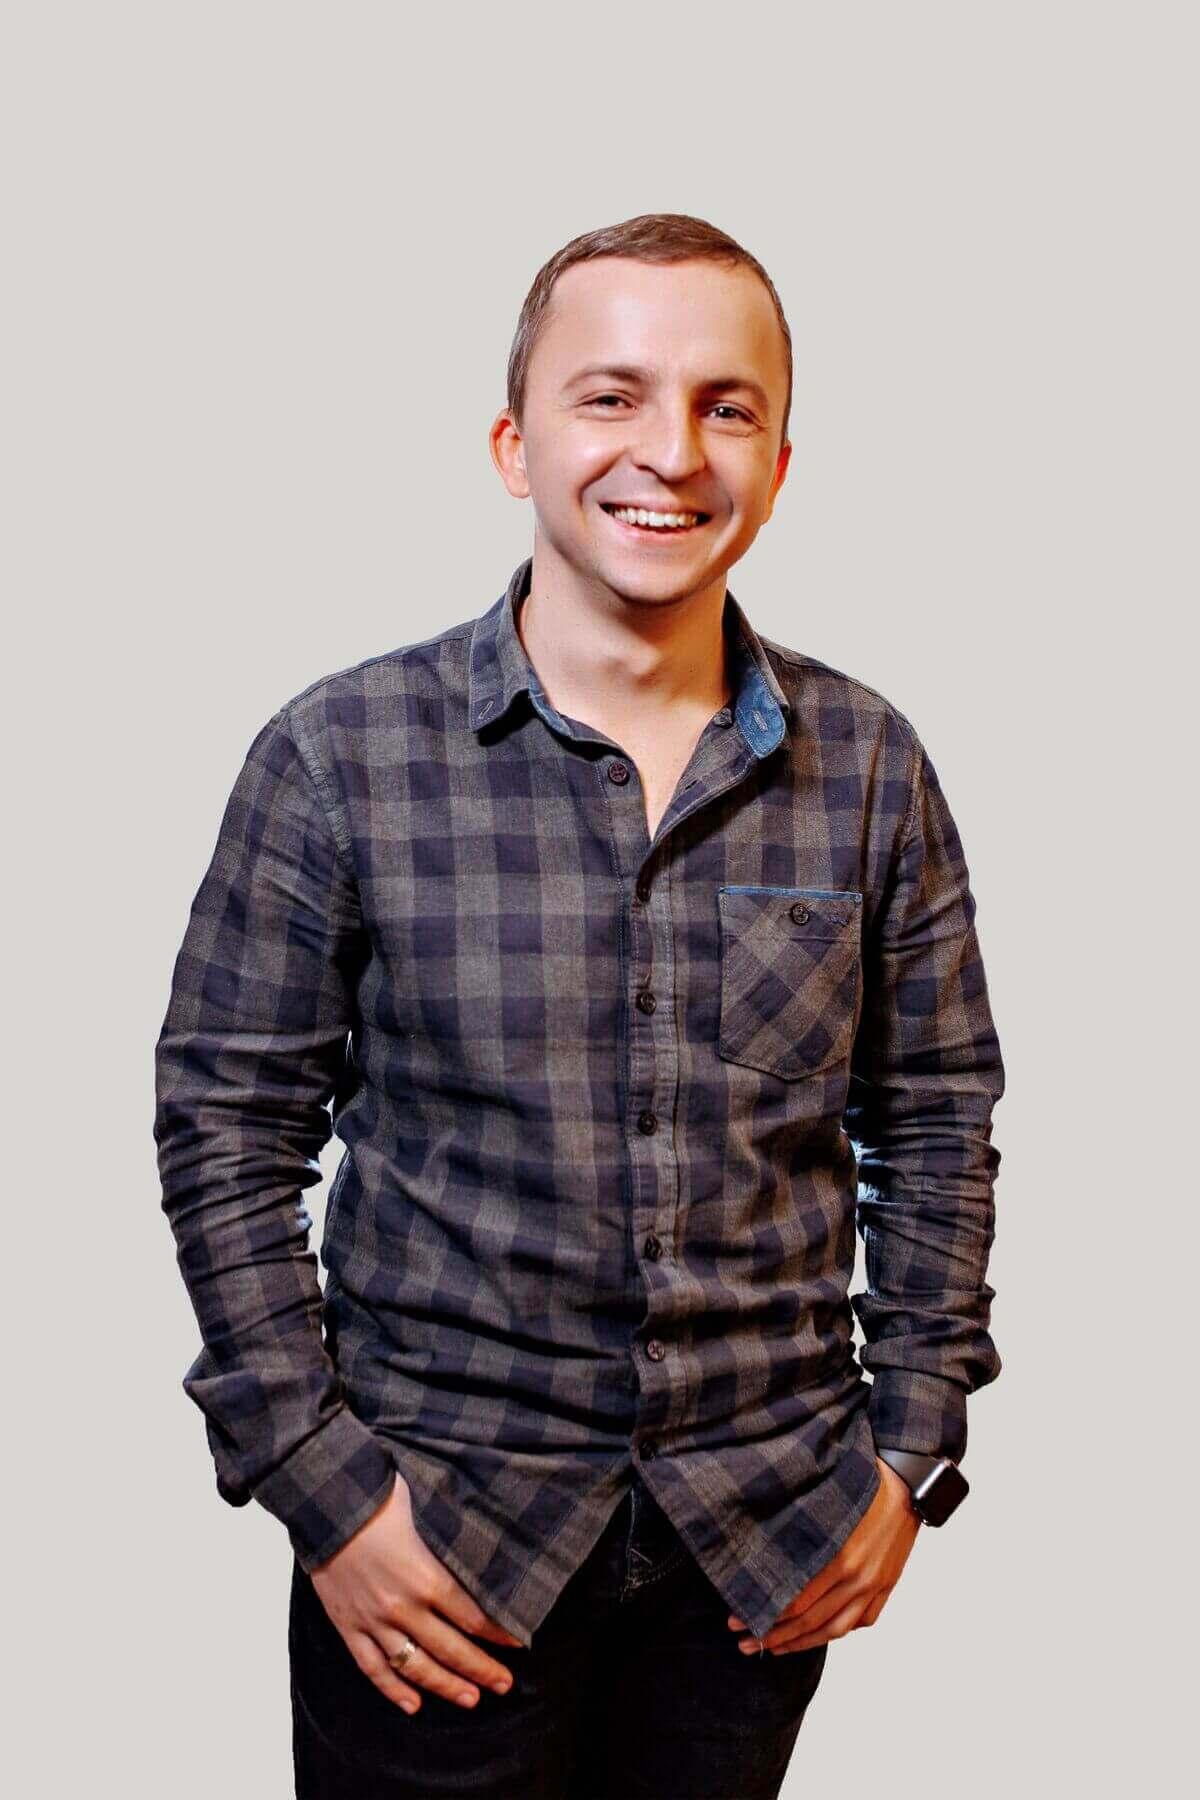 Anton CEO, Co-Founder